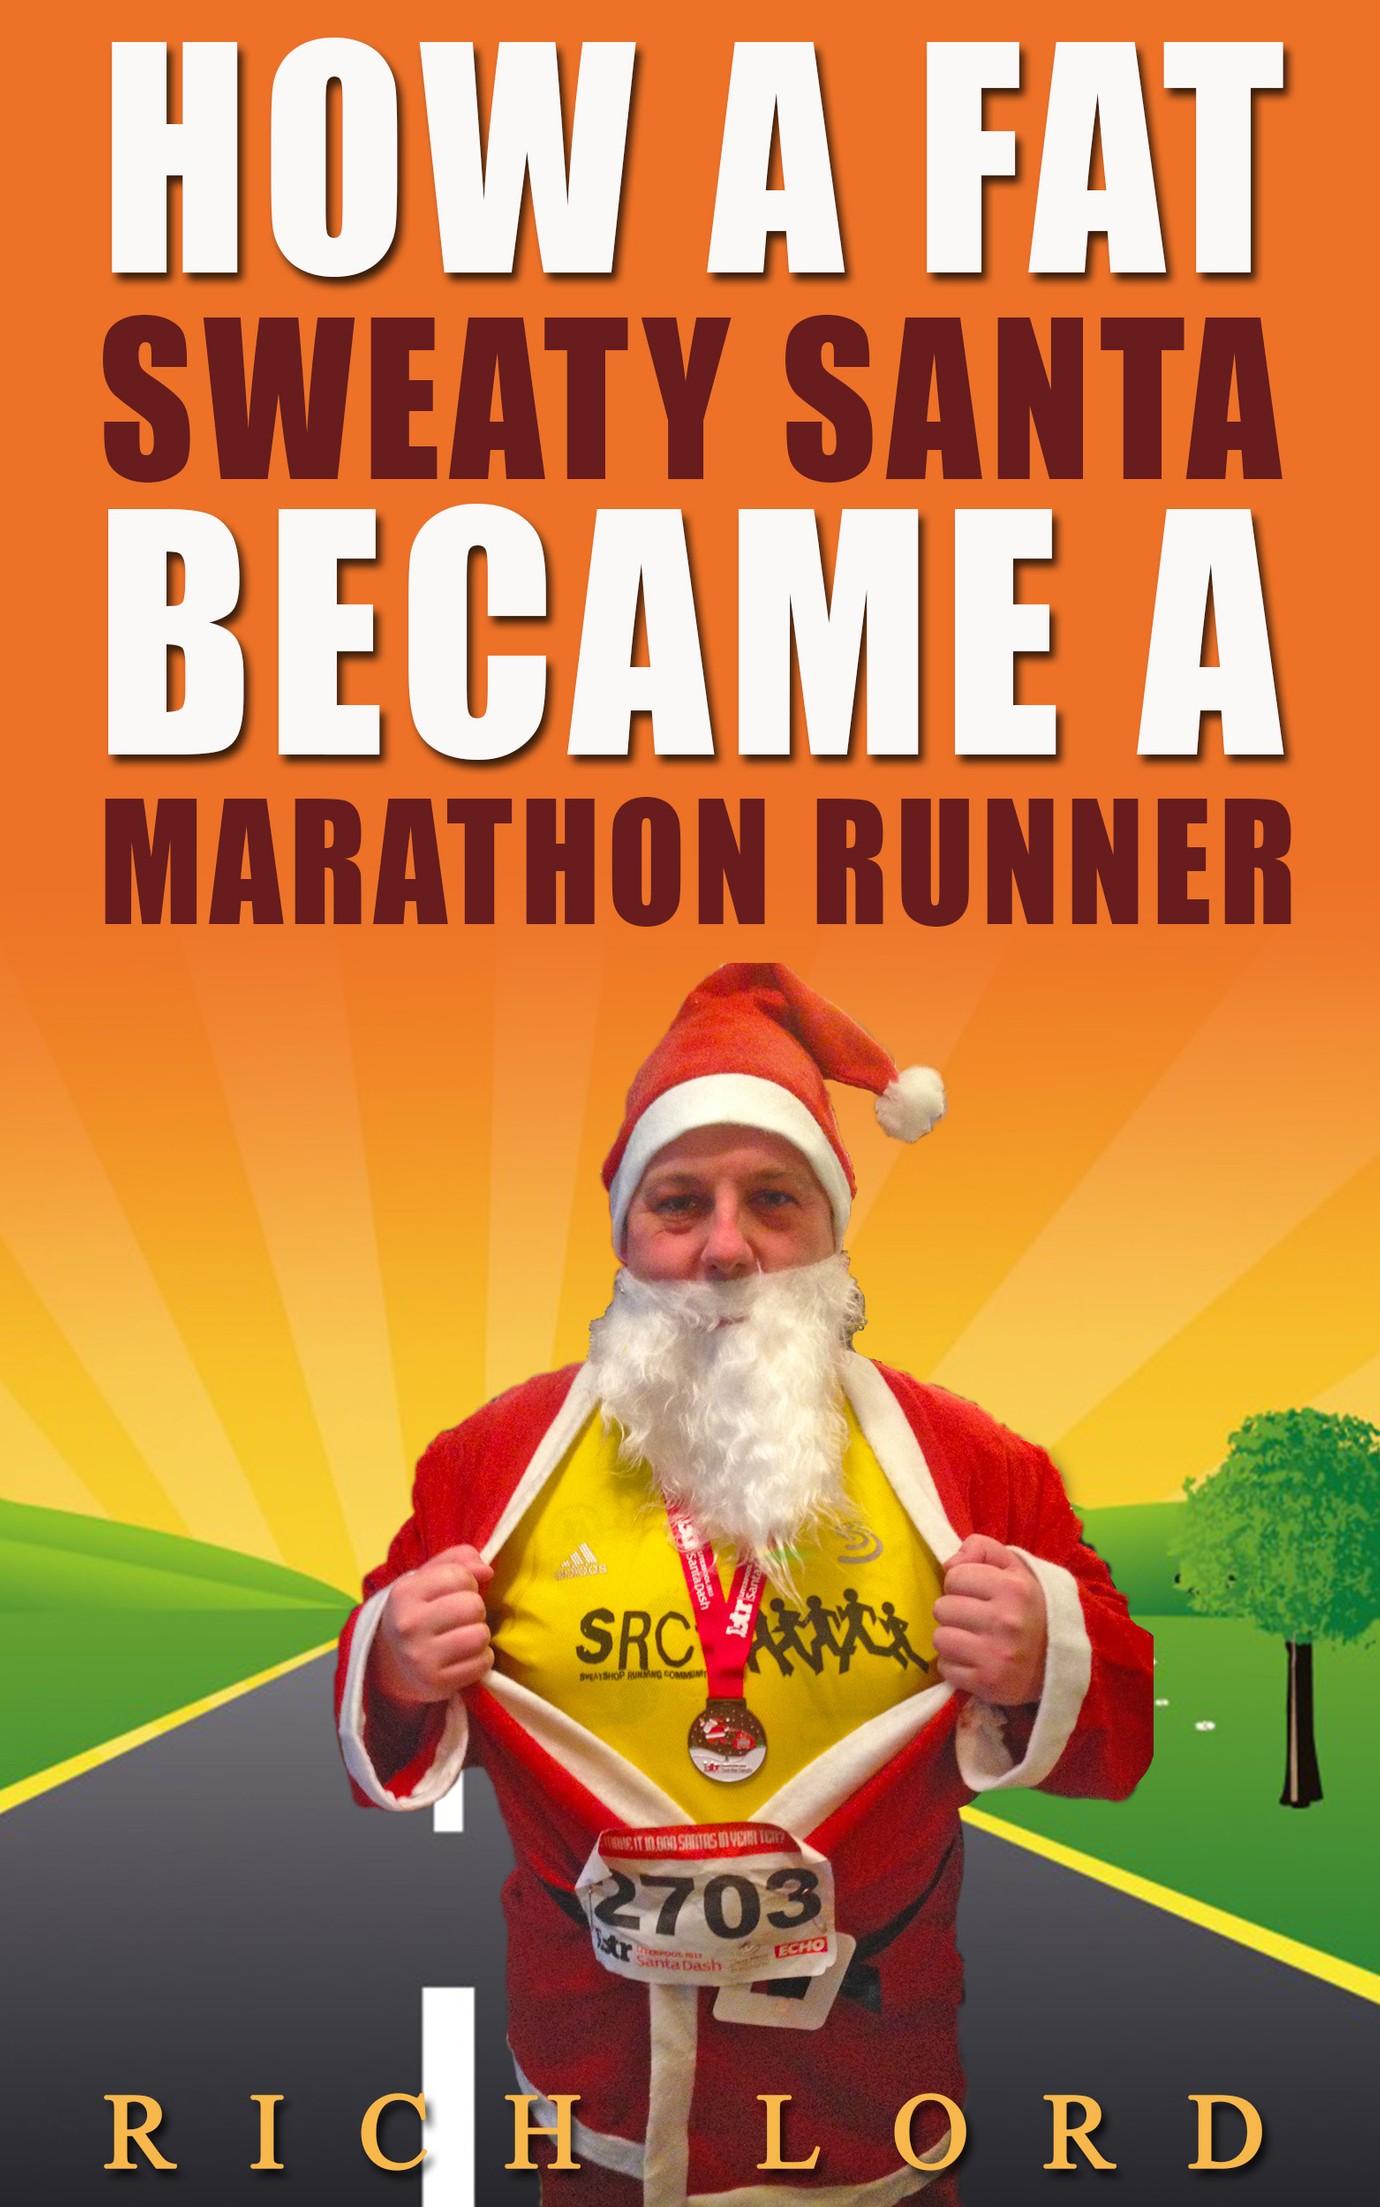 rich-lord-how-a-fat-sweaty-santa-became-a-marathon-runner